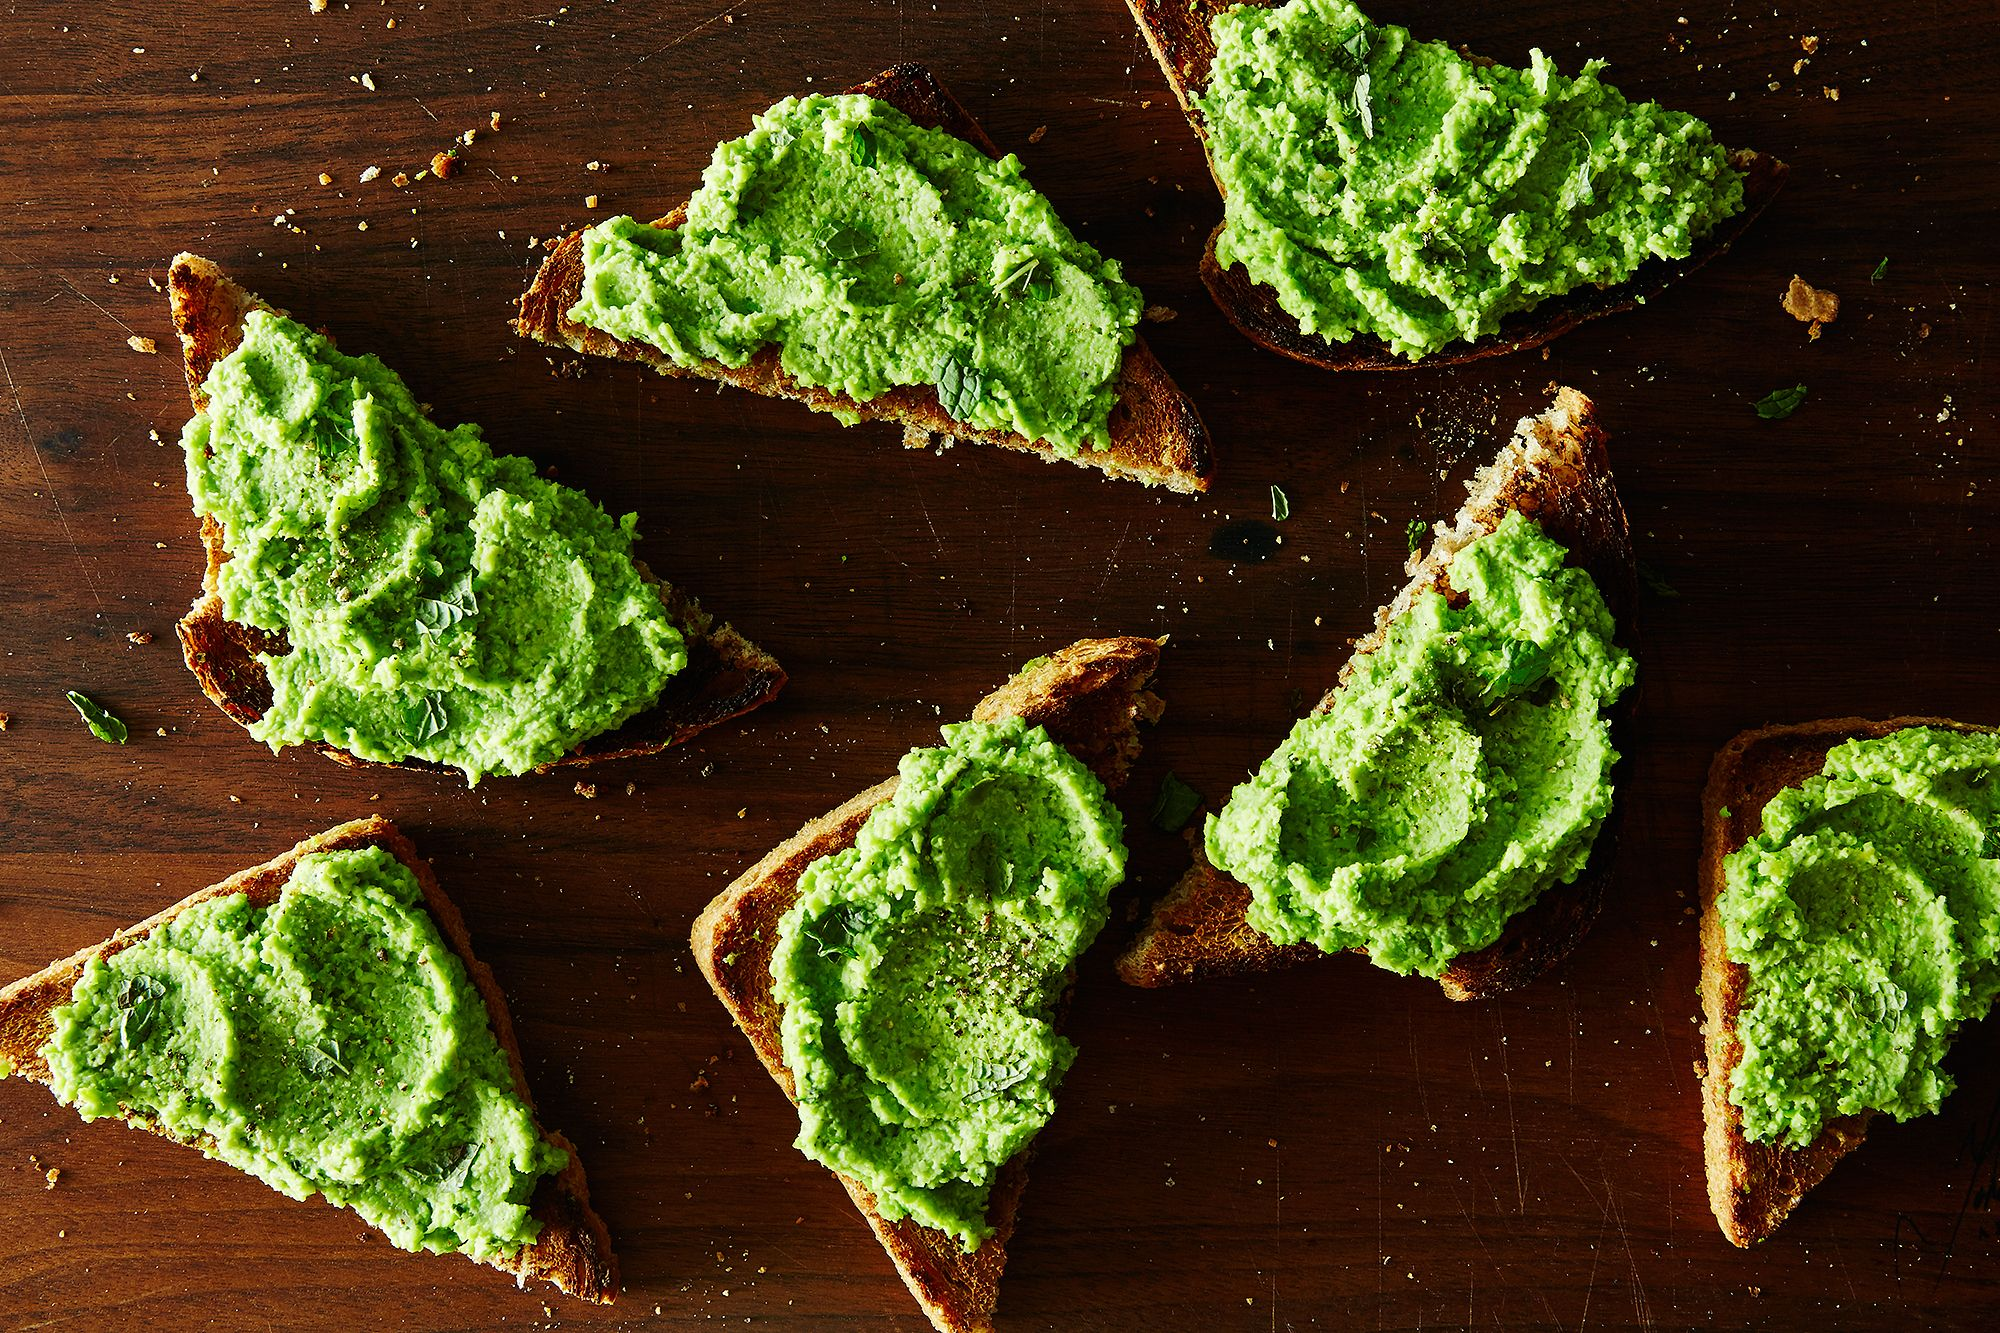 Spring Green Community Food Pantry